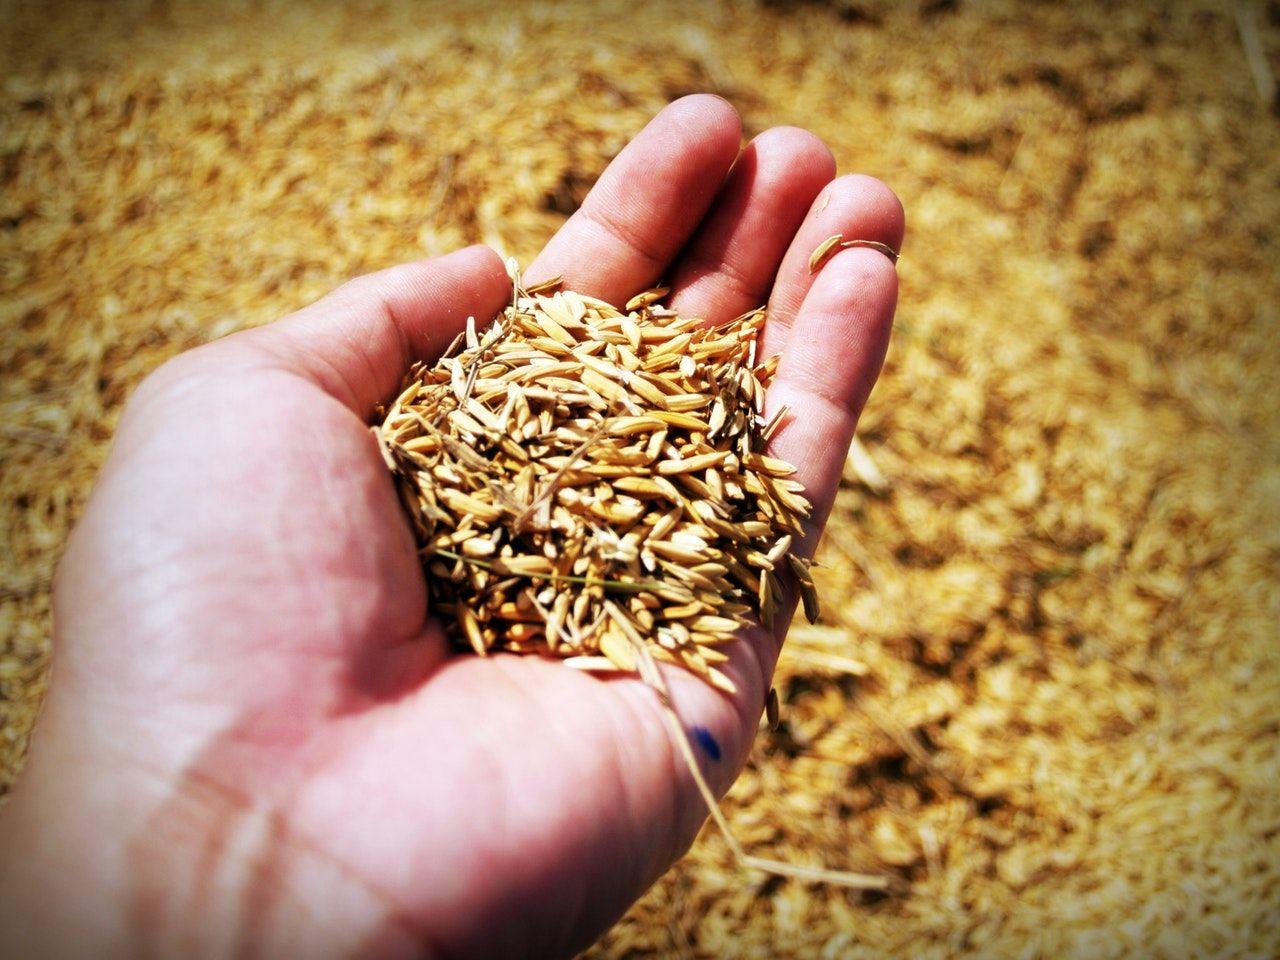 Benefits of a whole grain diet